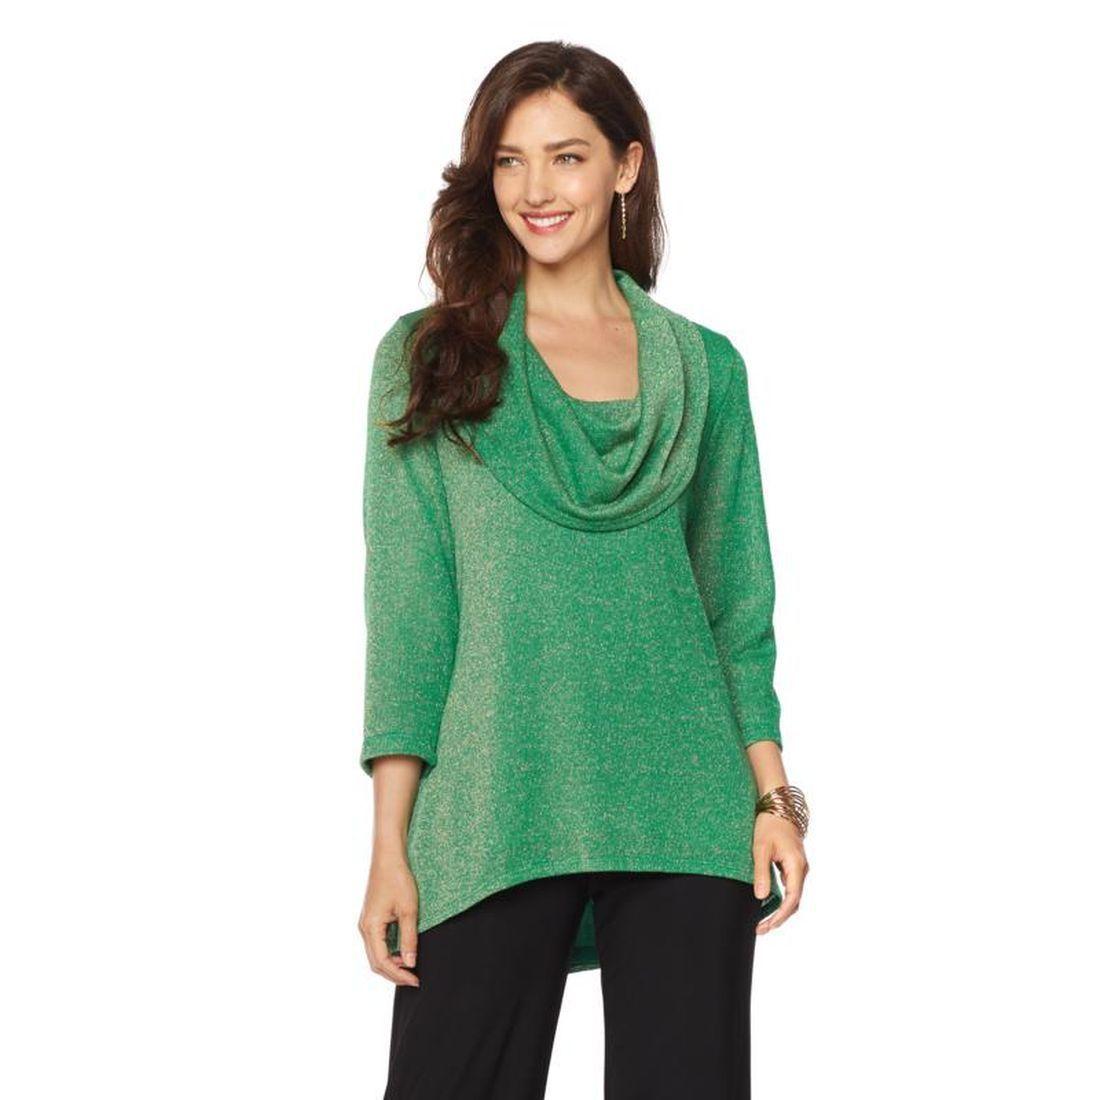 SLINKY BRAND 3/4-Sleeve Cowl Neck Sparkle Sweater EMERALD Size L